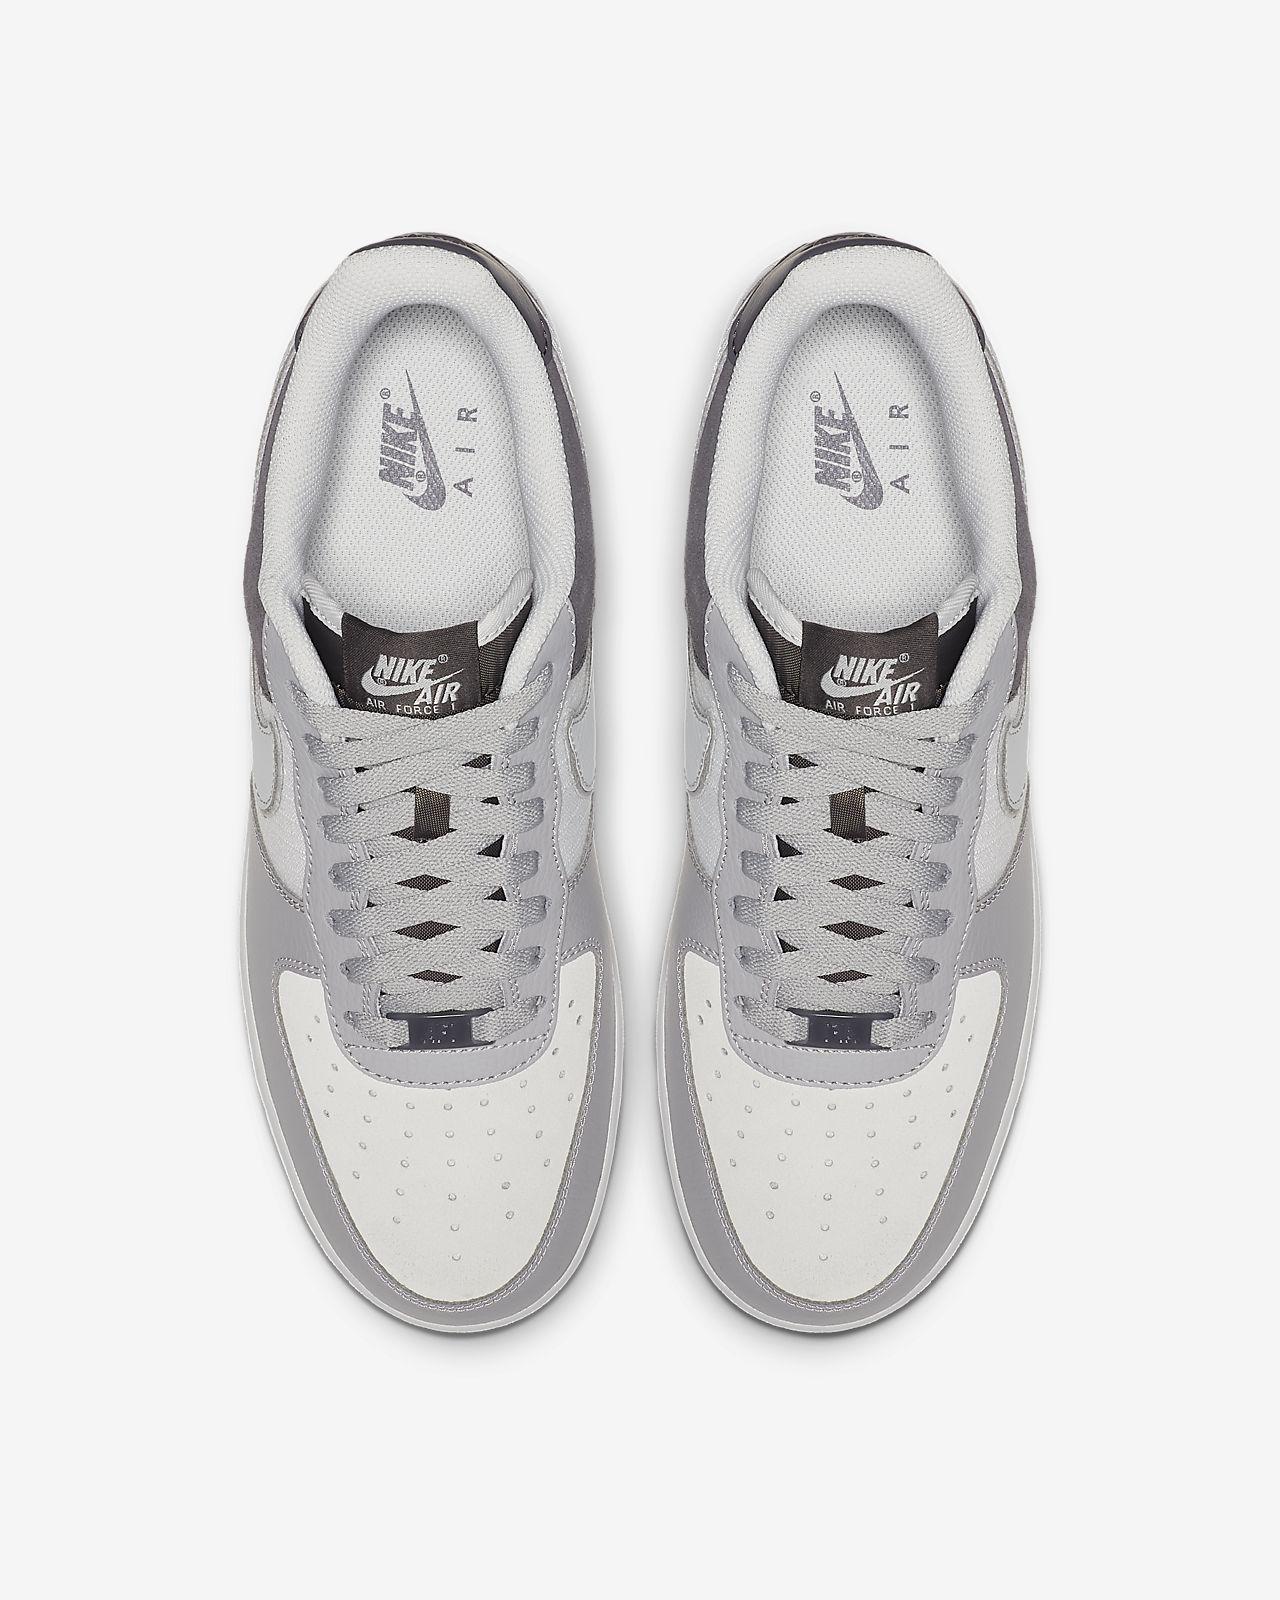 innovative design bf3f7 680d5 ... Nike Air Force 1  07 LV8 2 Men s Shoe